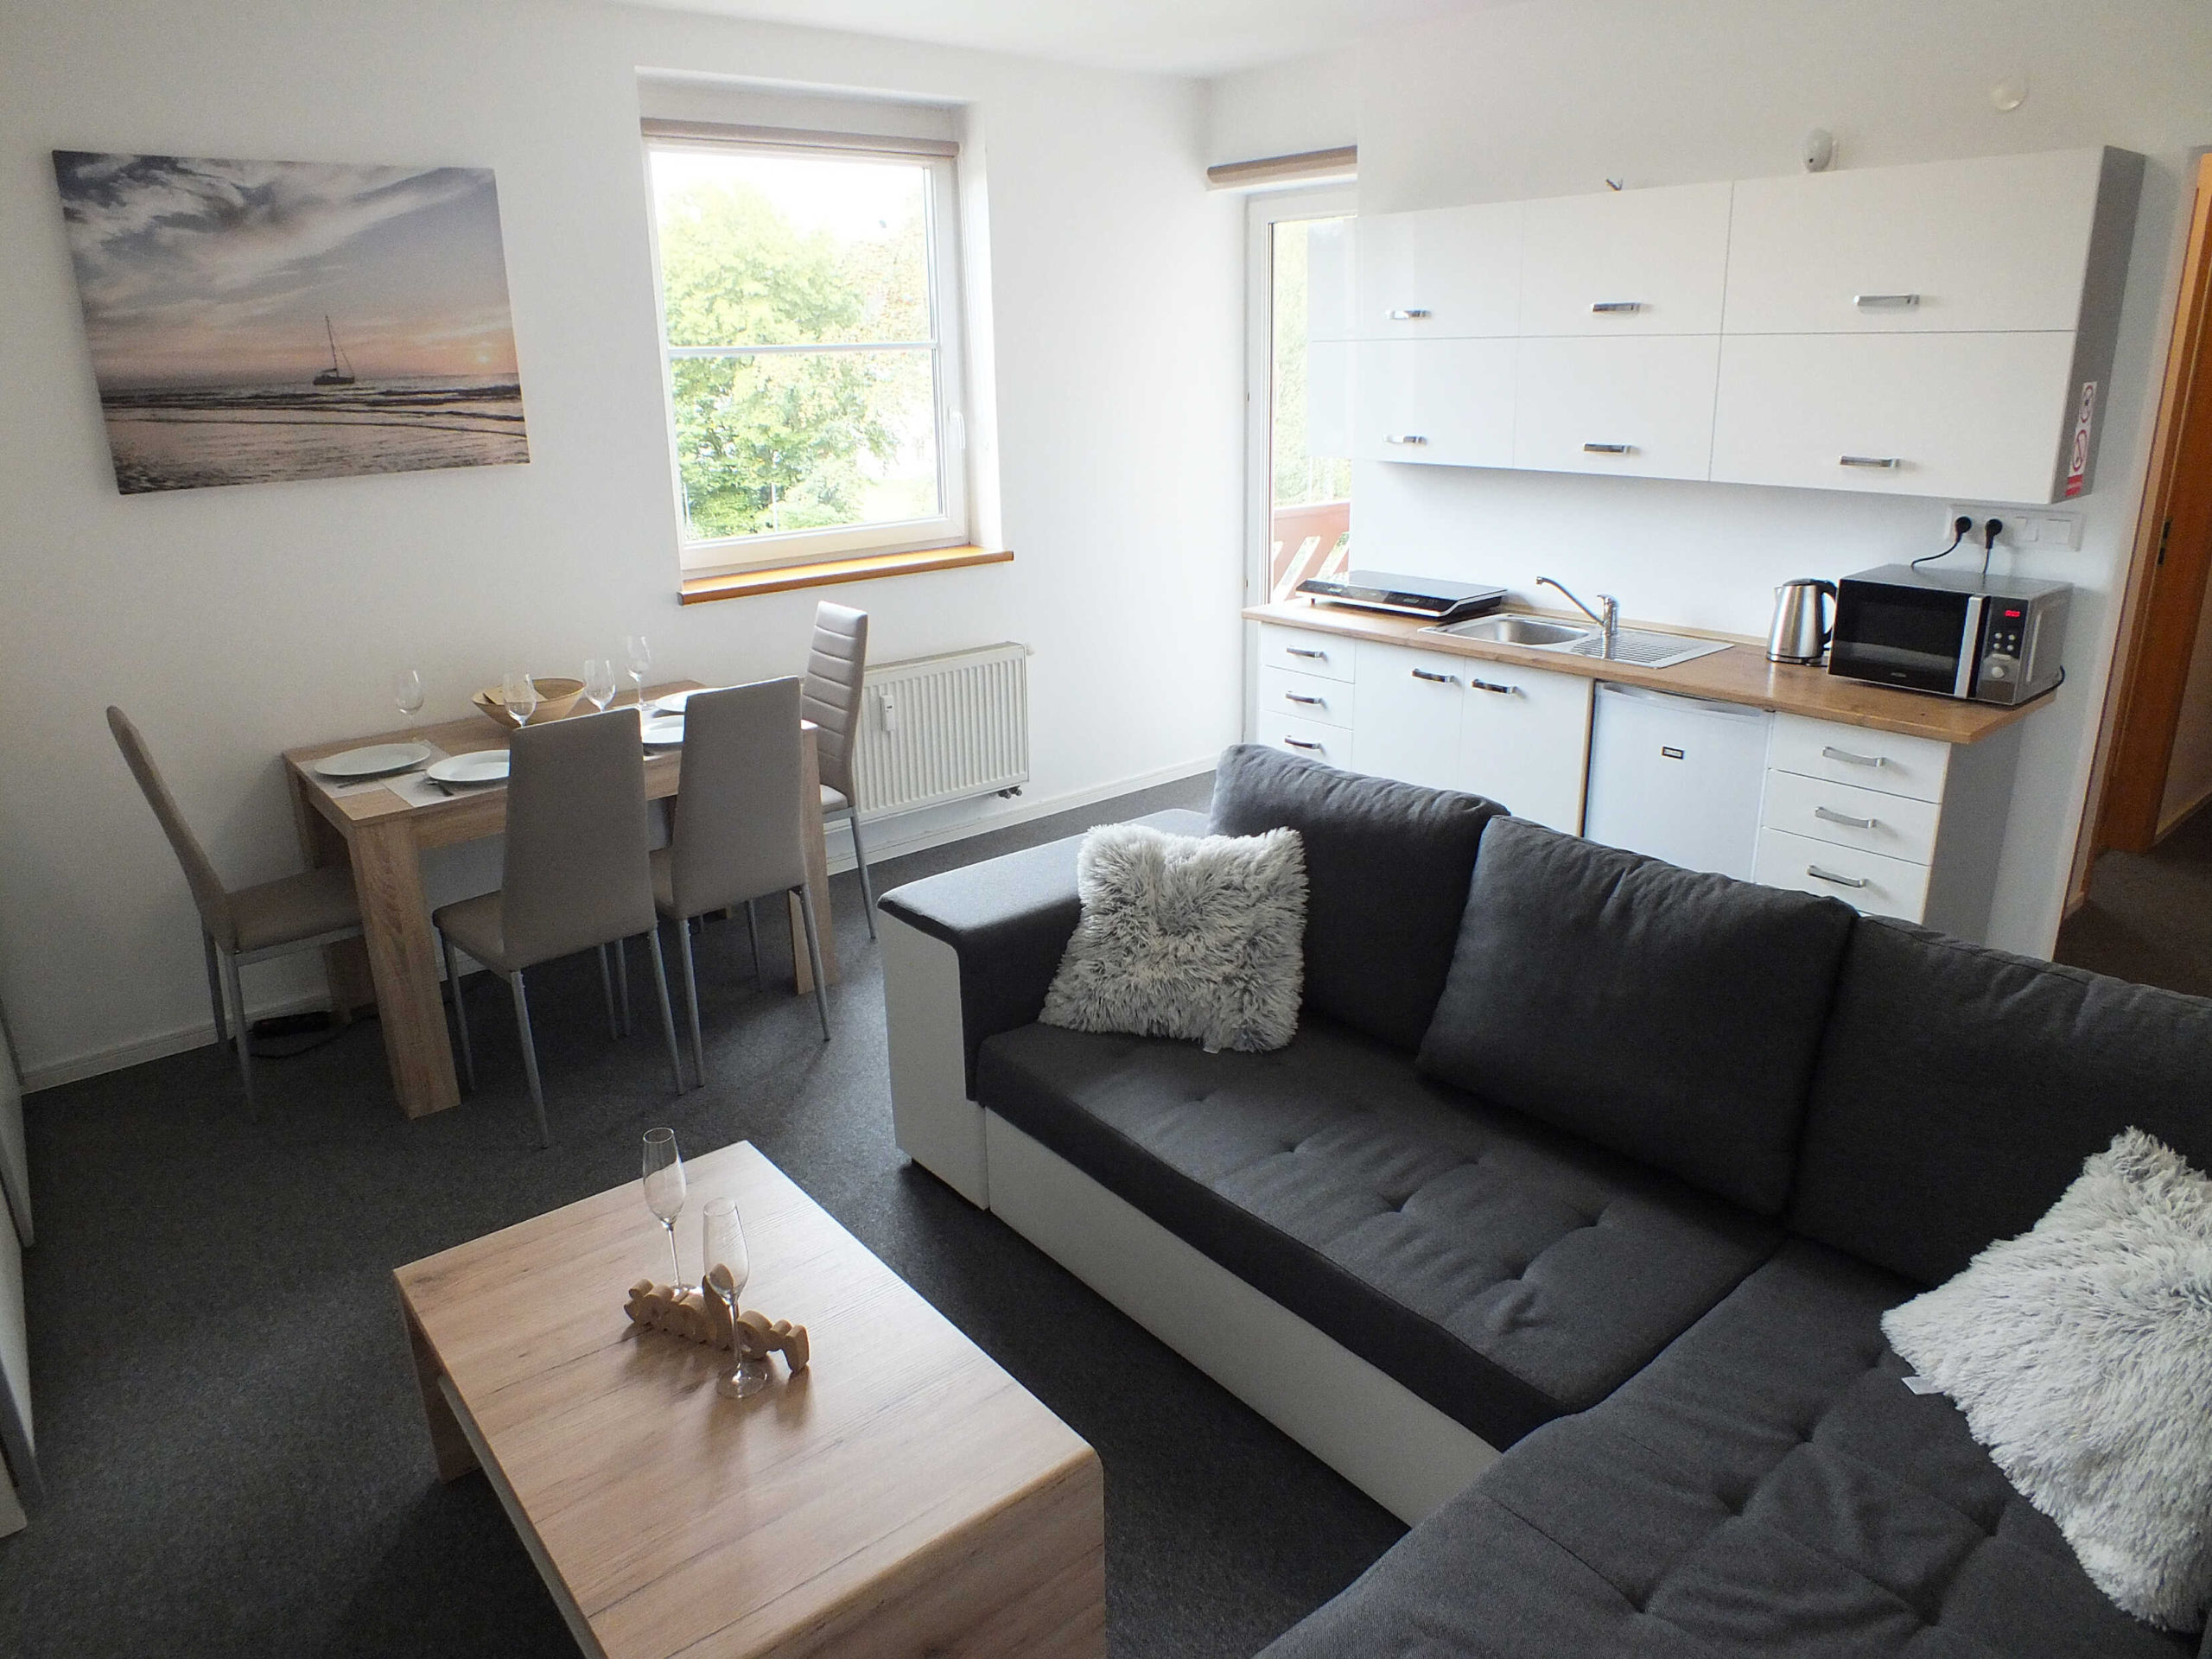 1618487337-apartman-obyvacia-izba-2-scaled.jpg